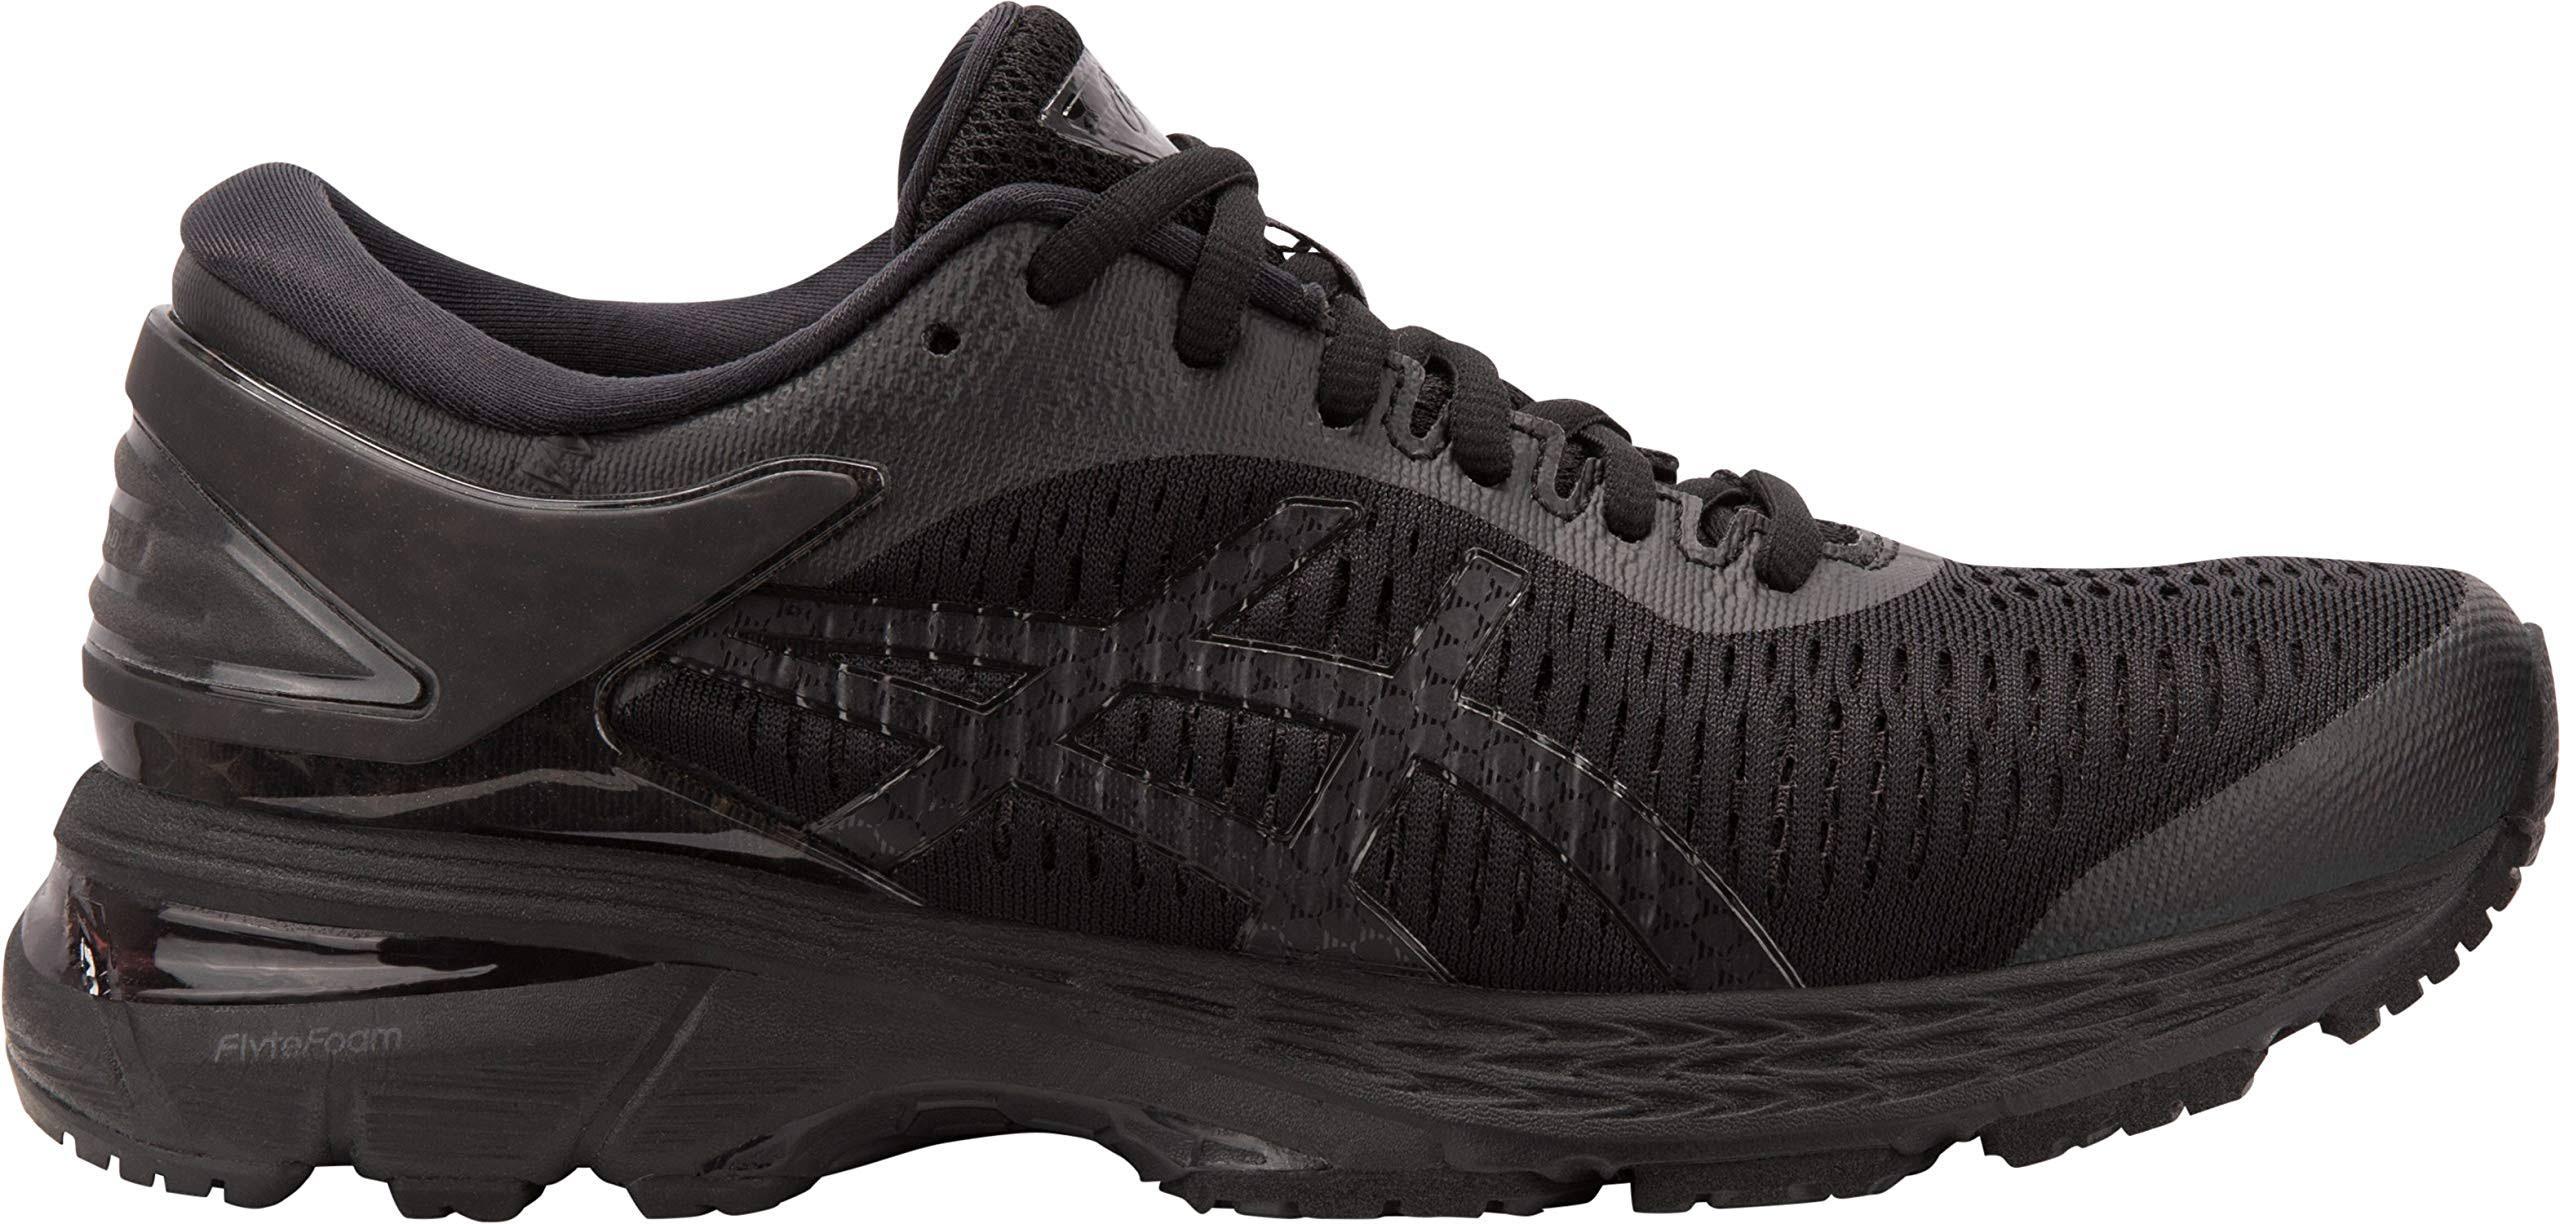 Running Para Asics 25 Zapatillas Mujer 1012a036002 De 6 Tamaño Gel kayano wx7wqXSF1